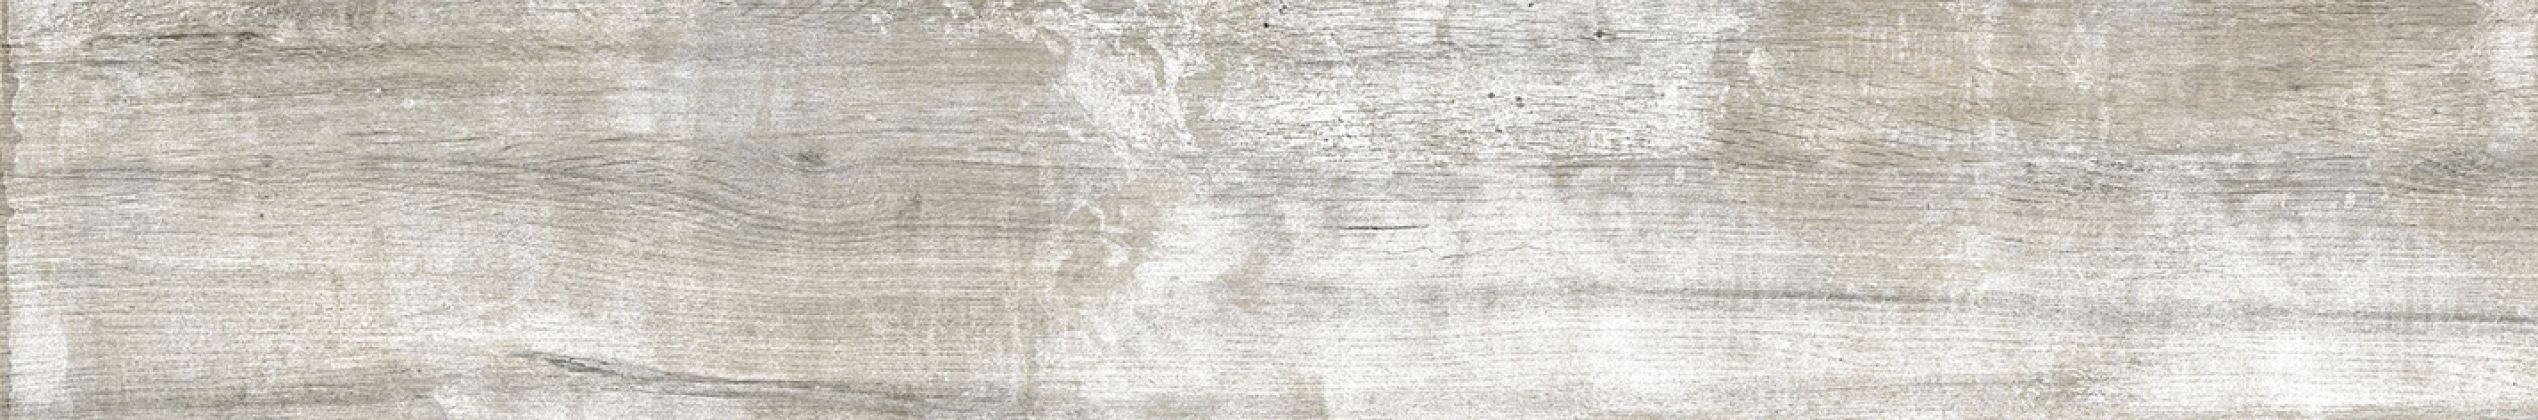 Pale Wood Керамогранит K-552/MR/ Серый 20x120